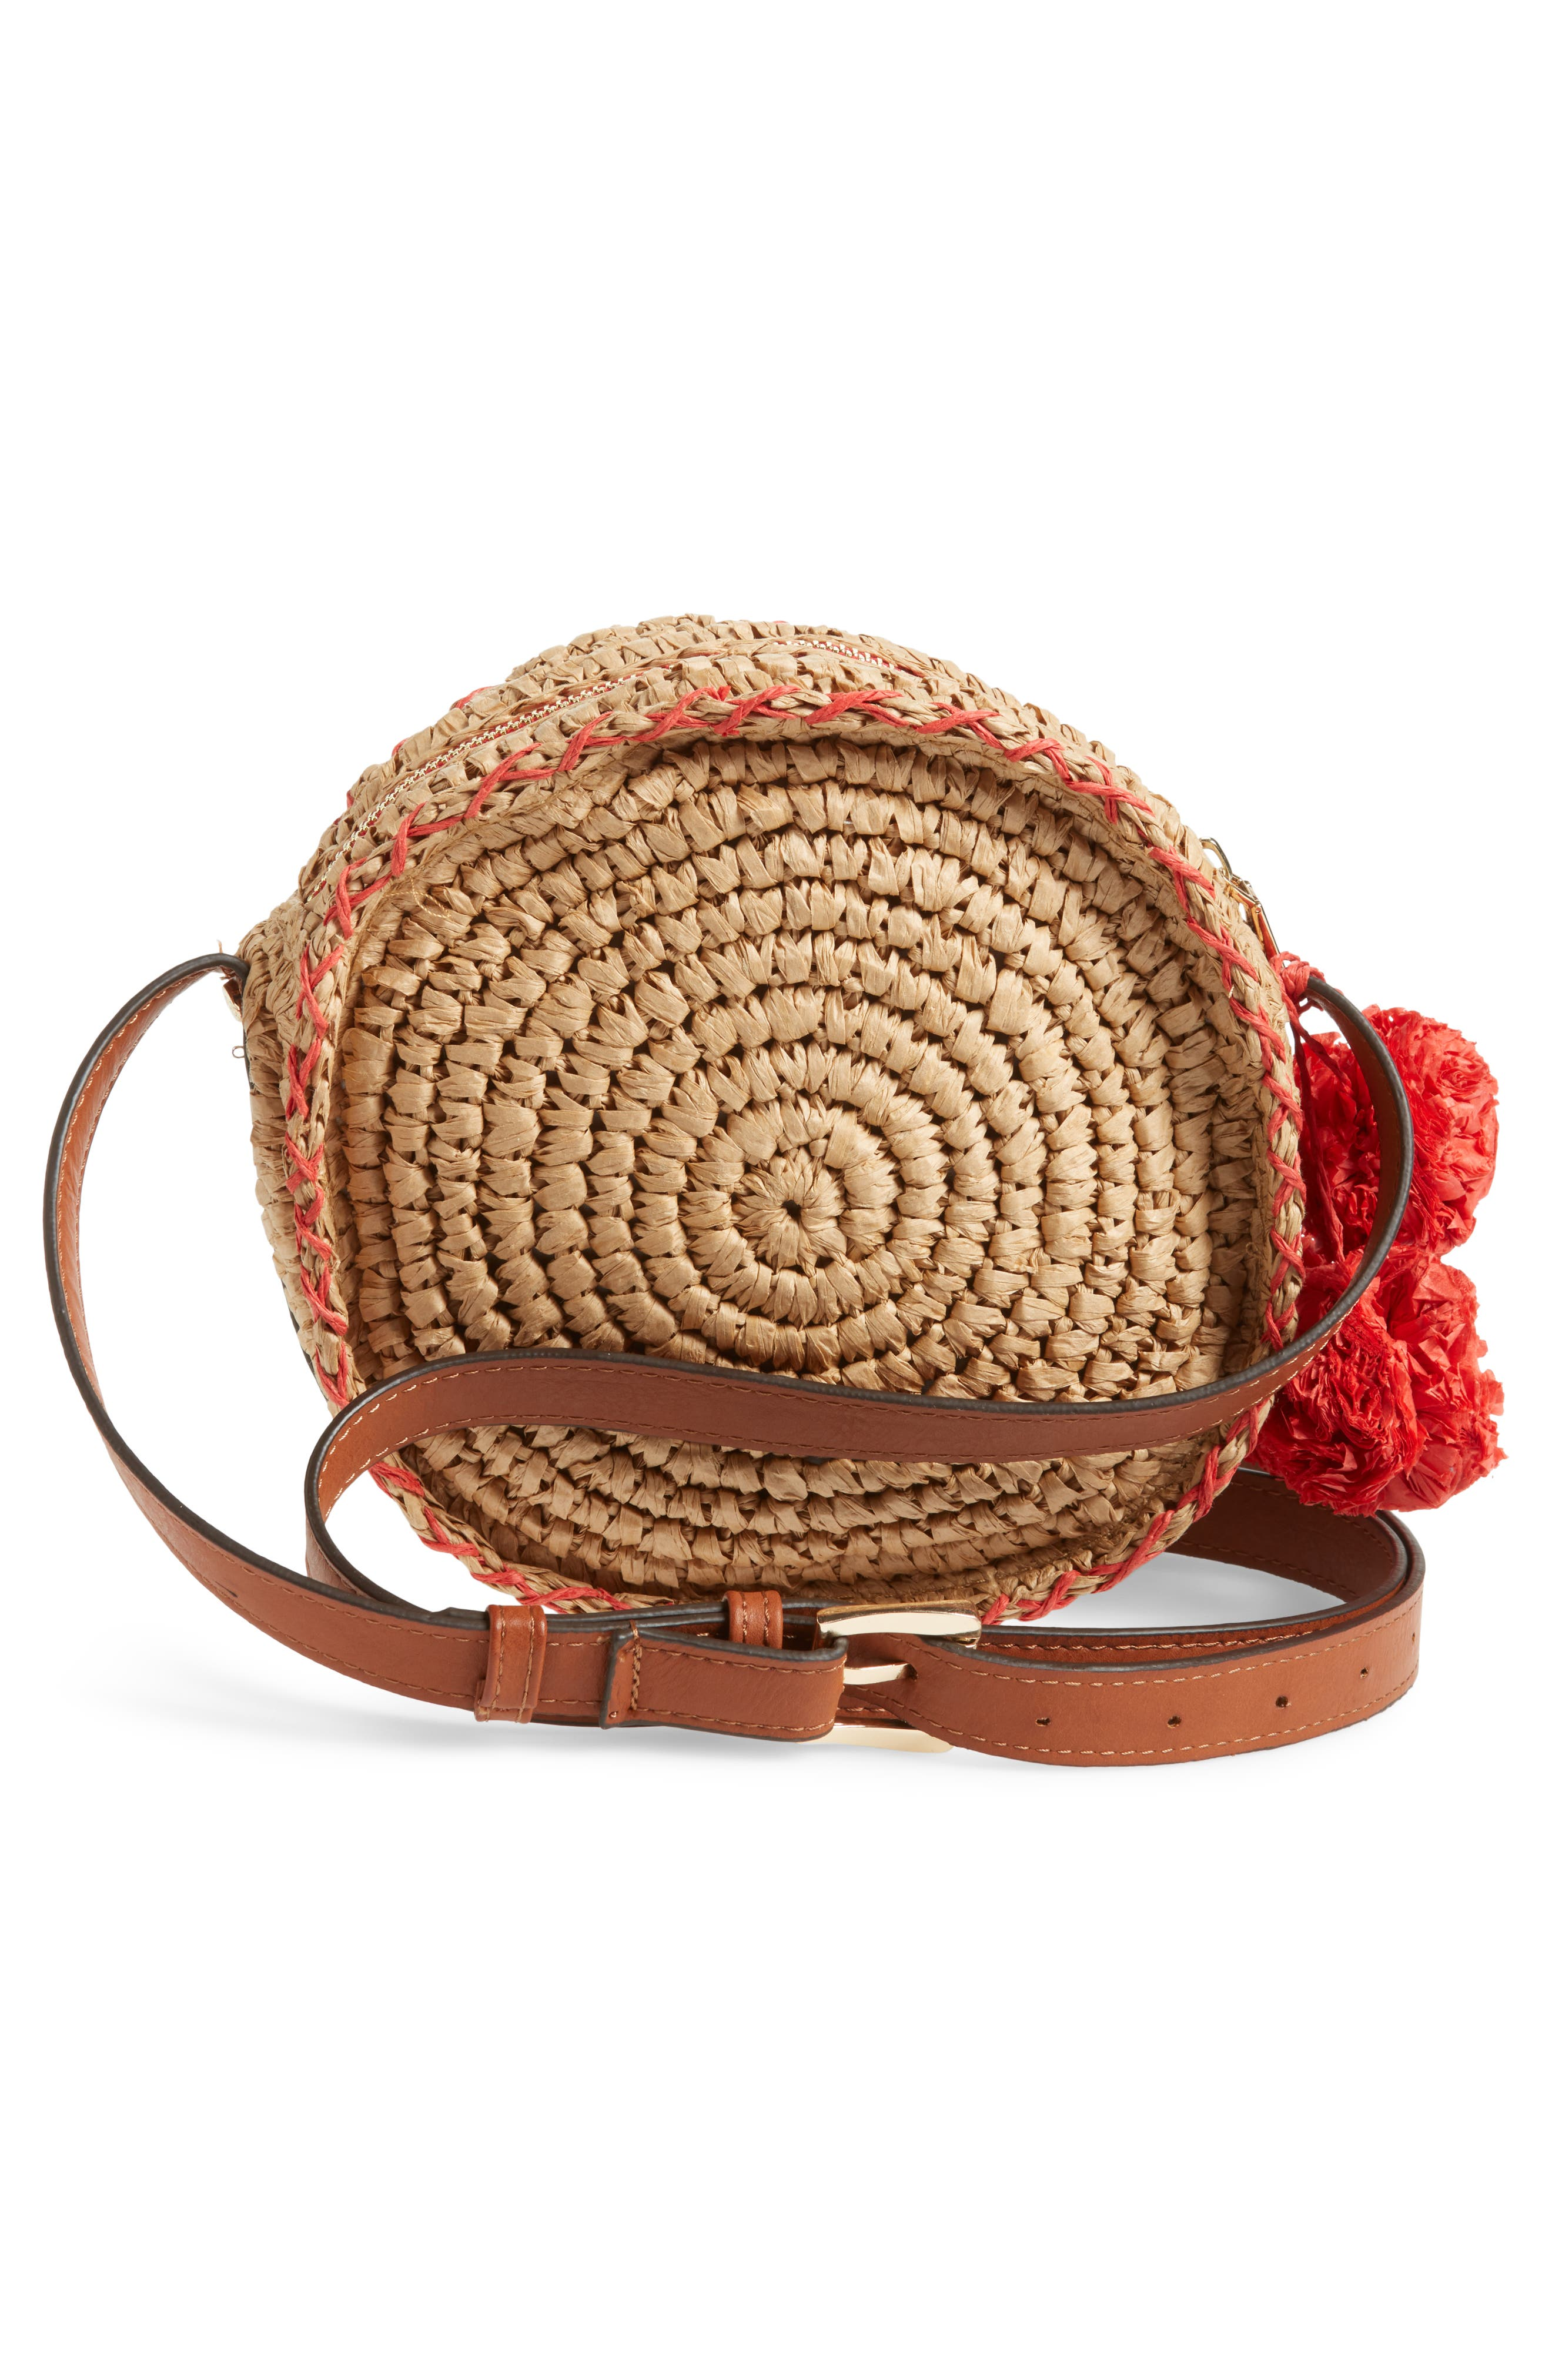 Pirro Woven Straw Crossbody Bag,                             Alternate thumbnail 3, color,                             237